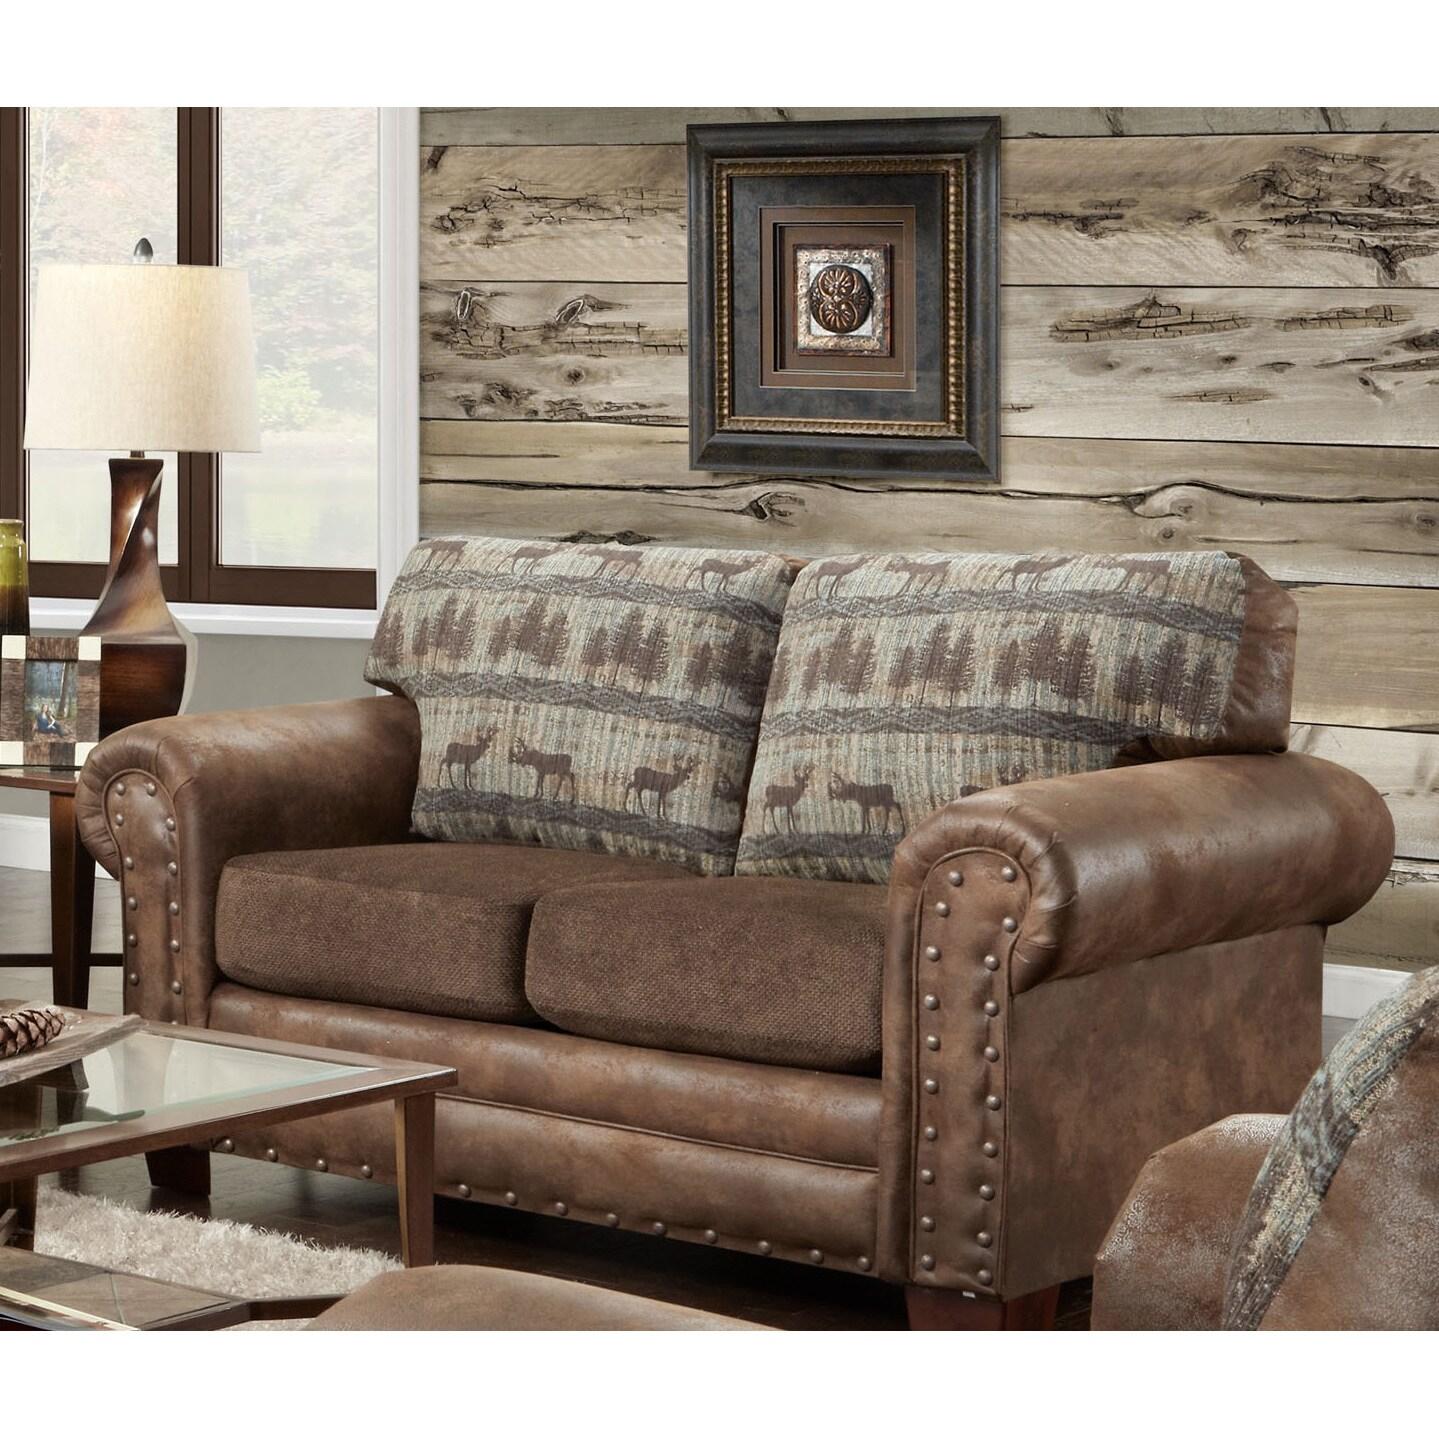 prod nail concealment accented udder src com gun classics p cowhide madness furniture head american ostkcdn bench